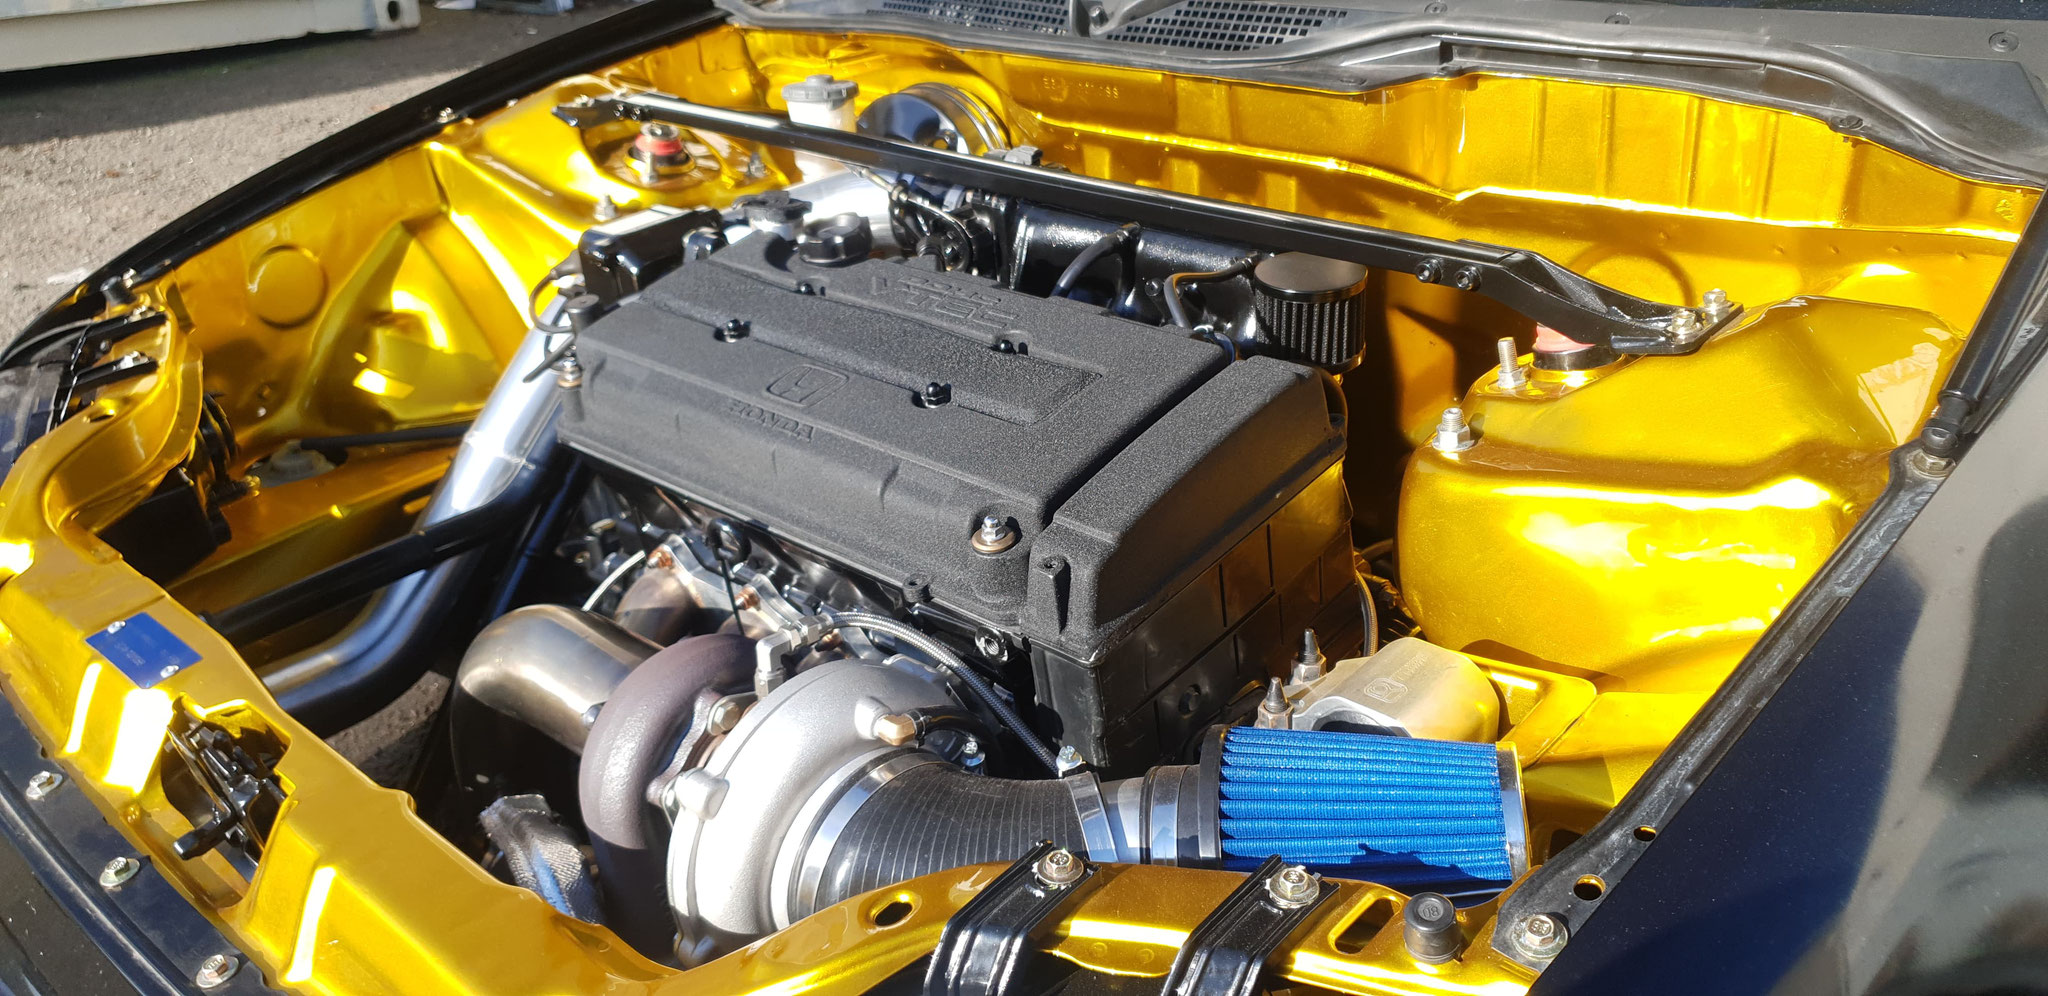 Turbo Honda Build